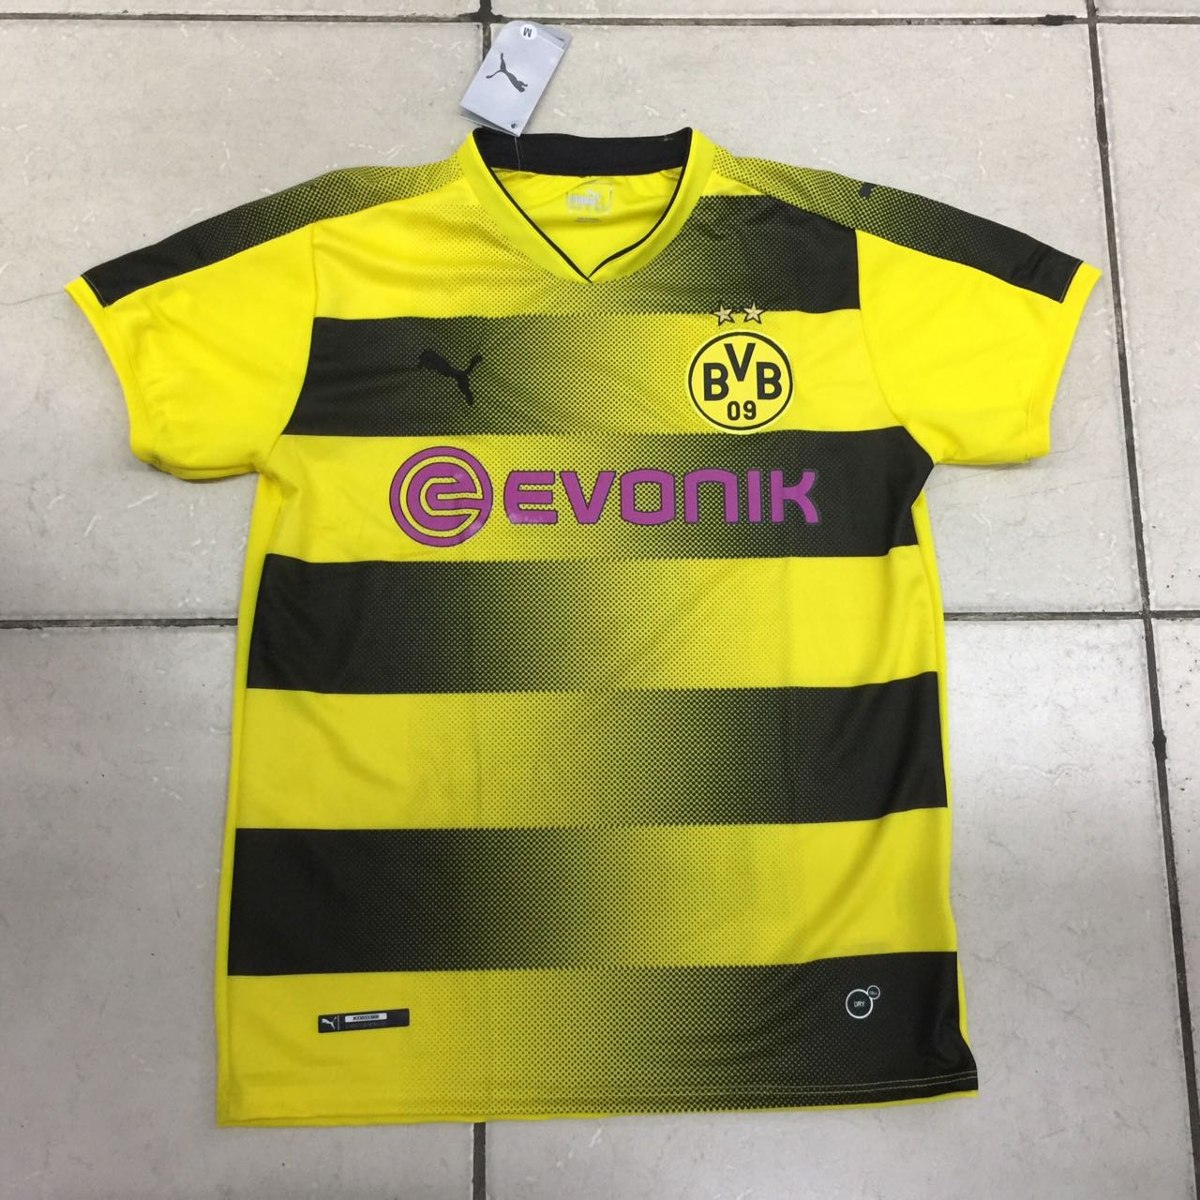 Nova Camisa Puma Borussia Dortmund 2017 2018 - R  75 ca84b9b9163ca